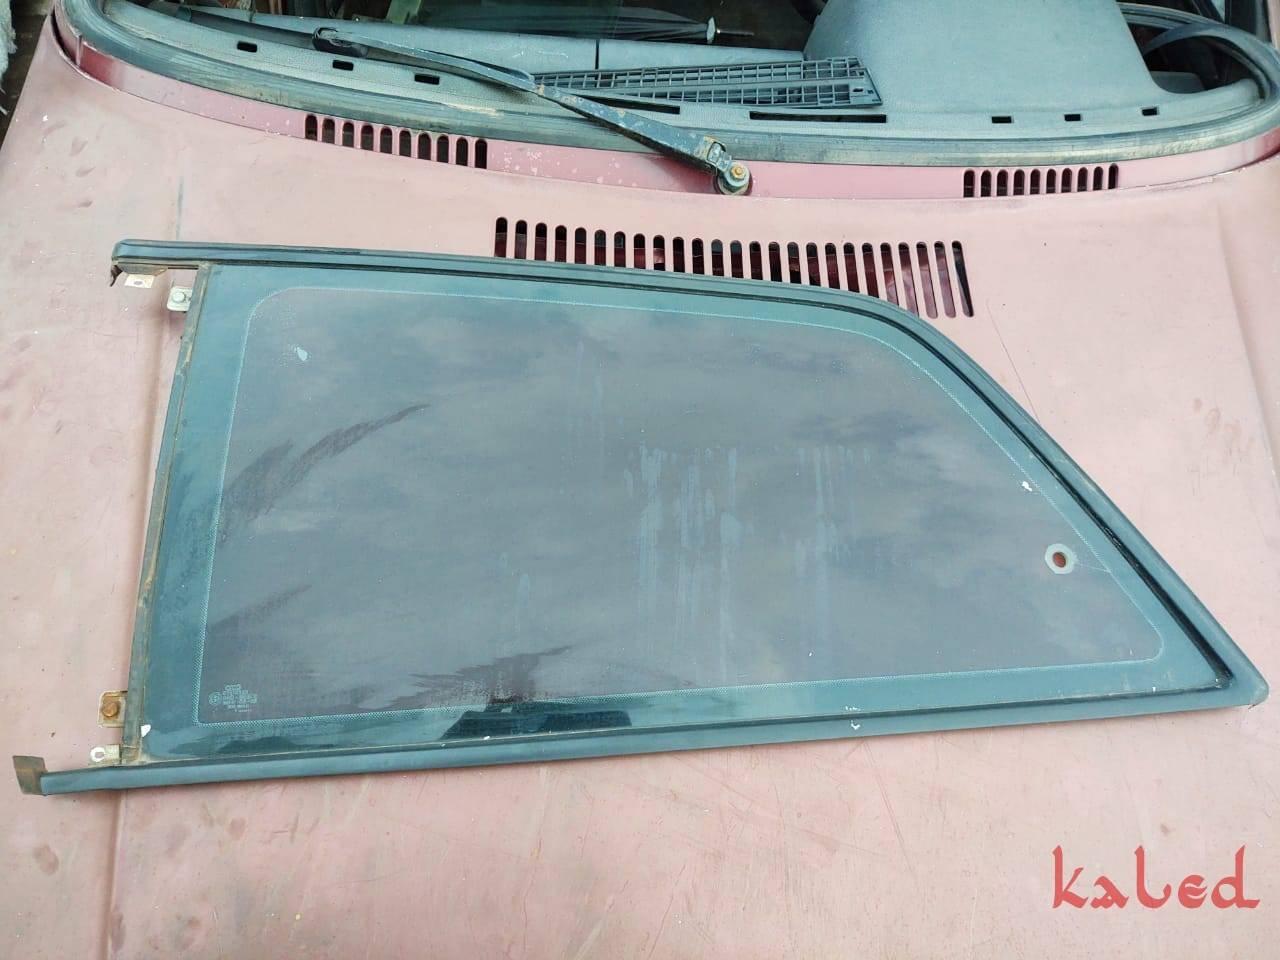 Vidro traseiro esquerdo Audi A3 2 portas 98 a 2006 - Kaled Auto Parts